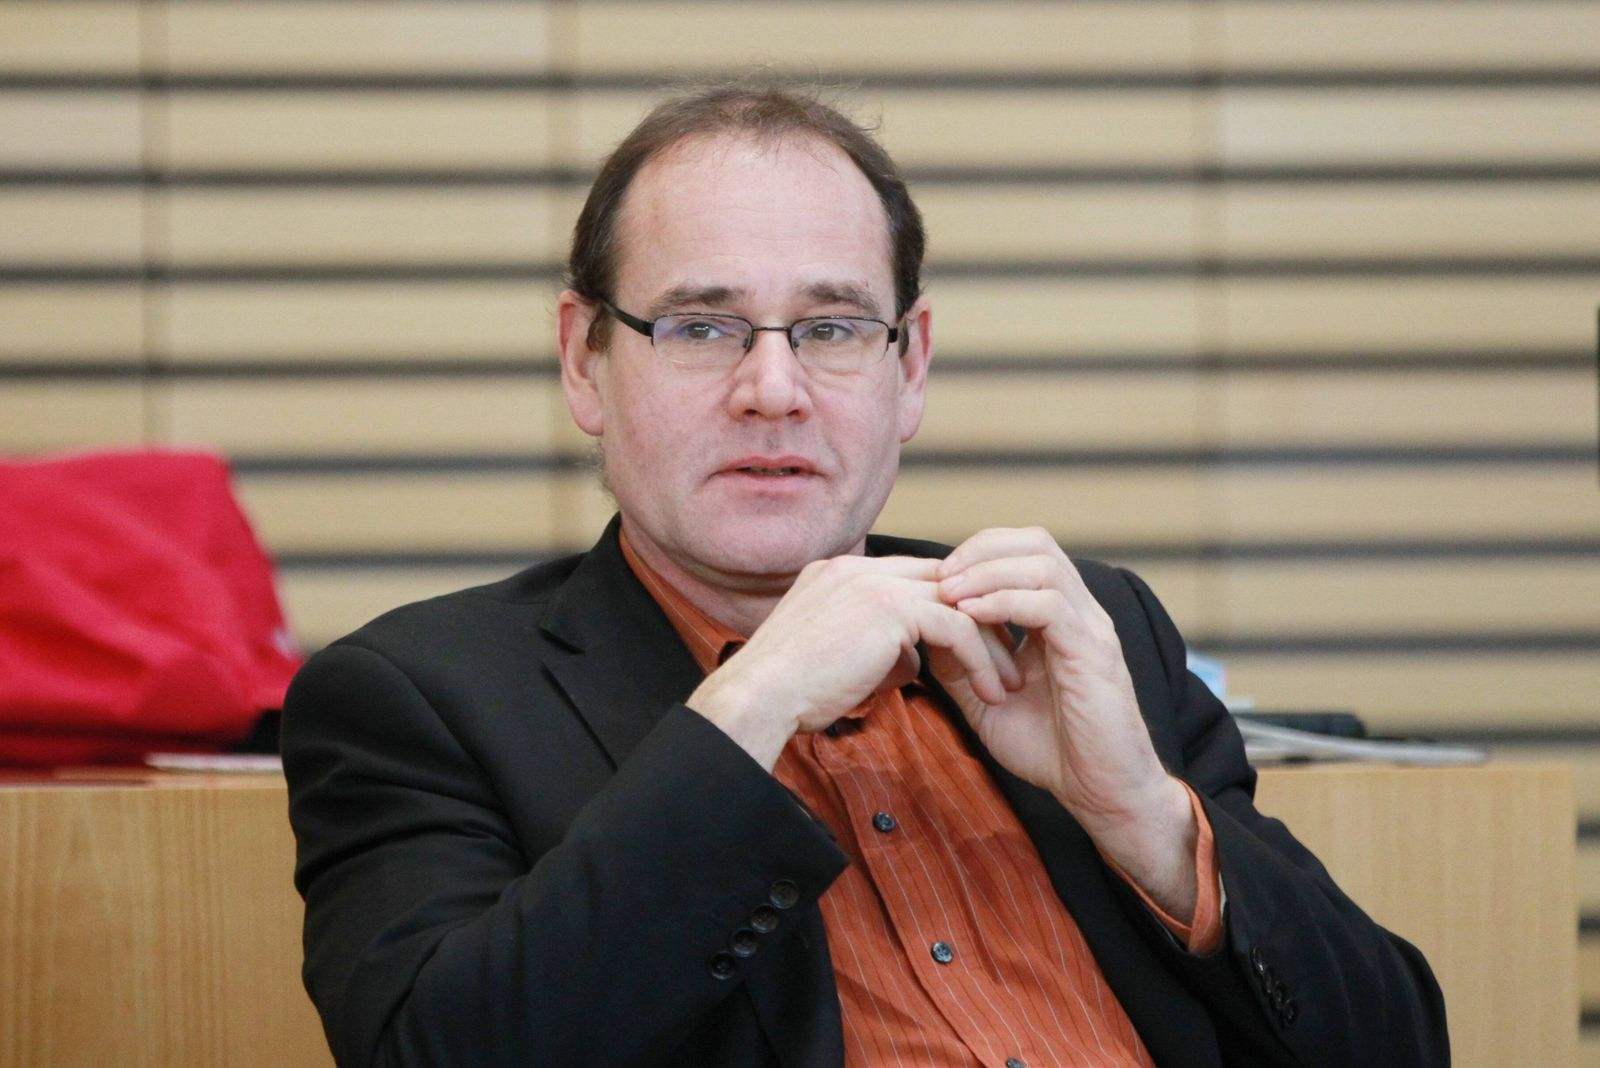 Plenum Thüringer Landtag 17 03 16 Erfurt Thüringer Landtag Plenarsaal 6 Wahlperiode Plenarsitz